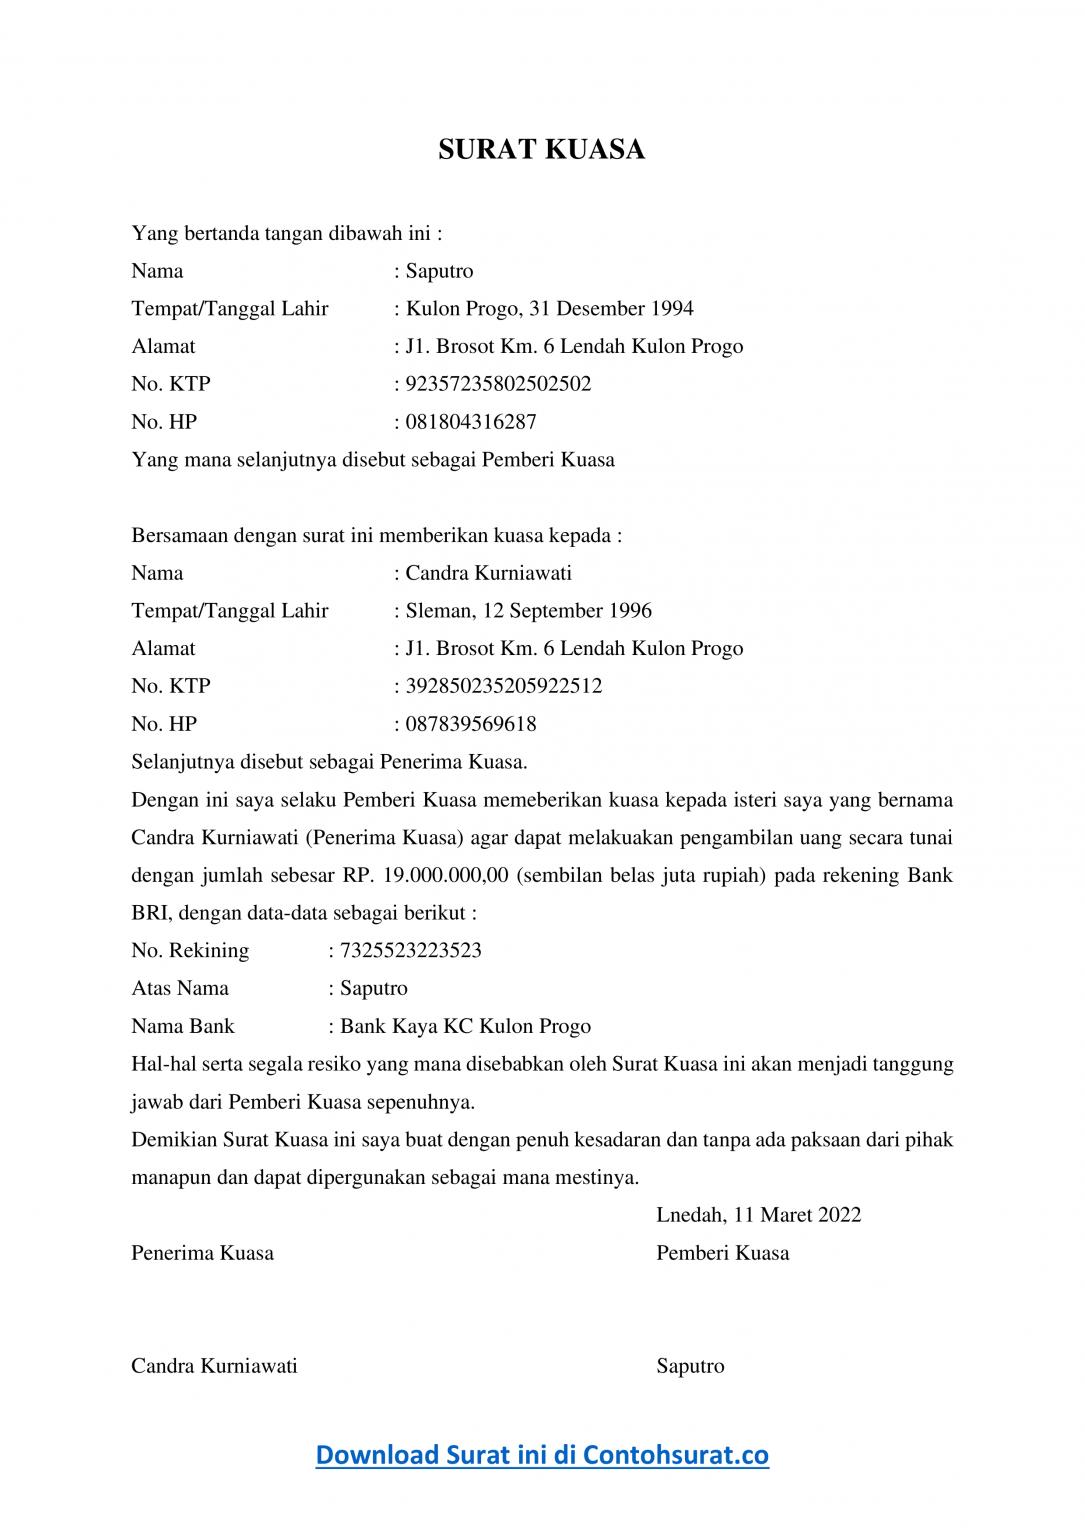 Contoh Surat Kuasa Pengambilan Uang di Bank BRI - Contoh Surat